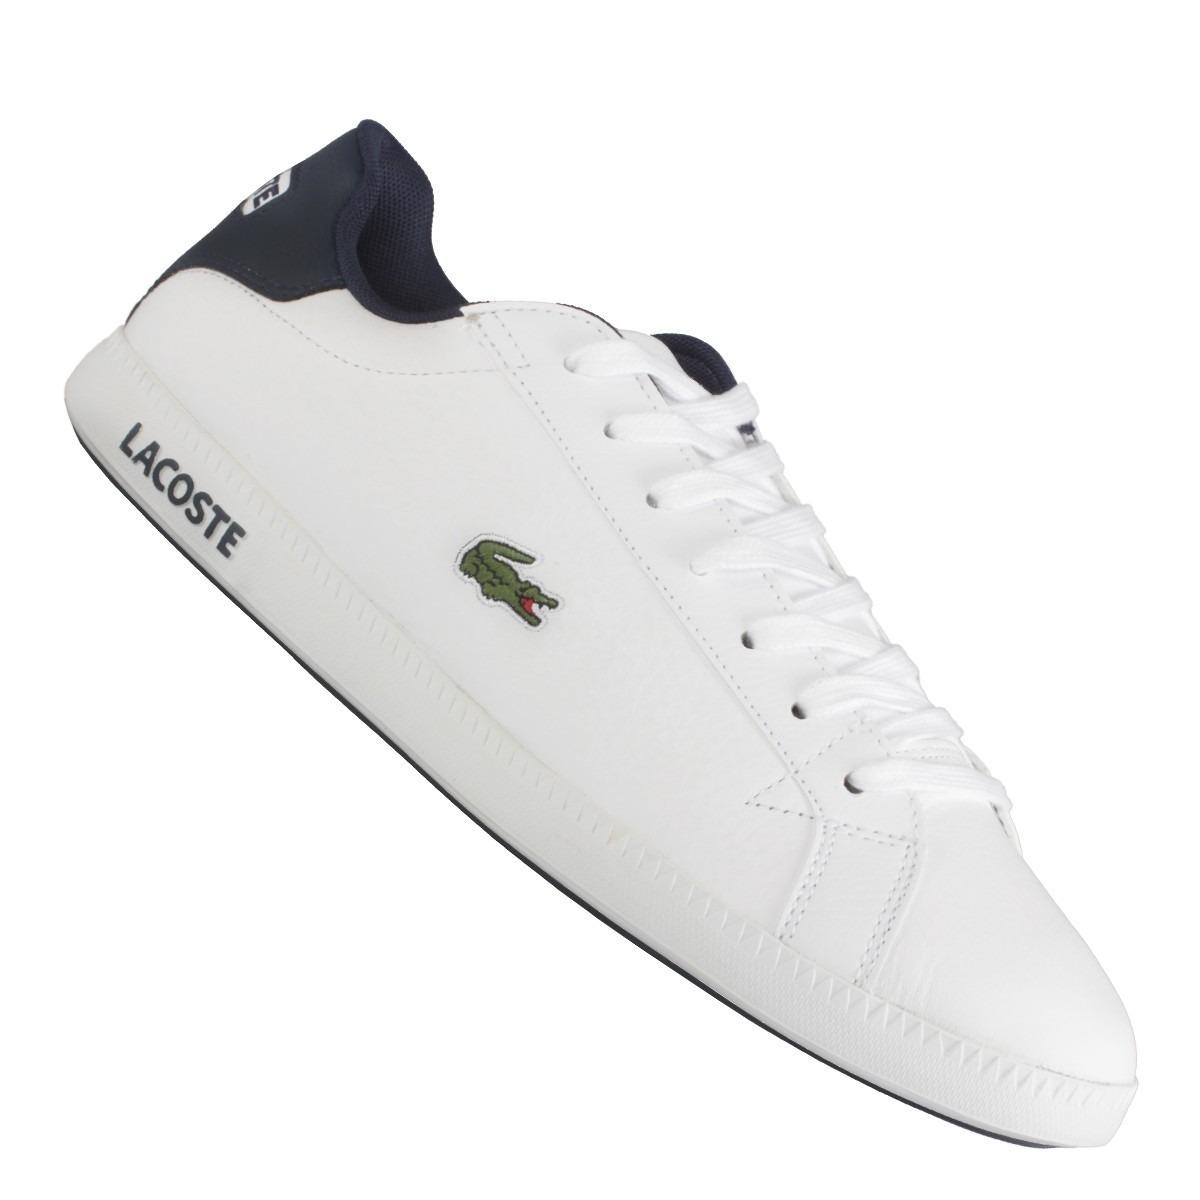 tênis lacoste branco graduate lcr3 spm original masculino. Carregando zoom. b50ba6a7ee